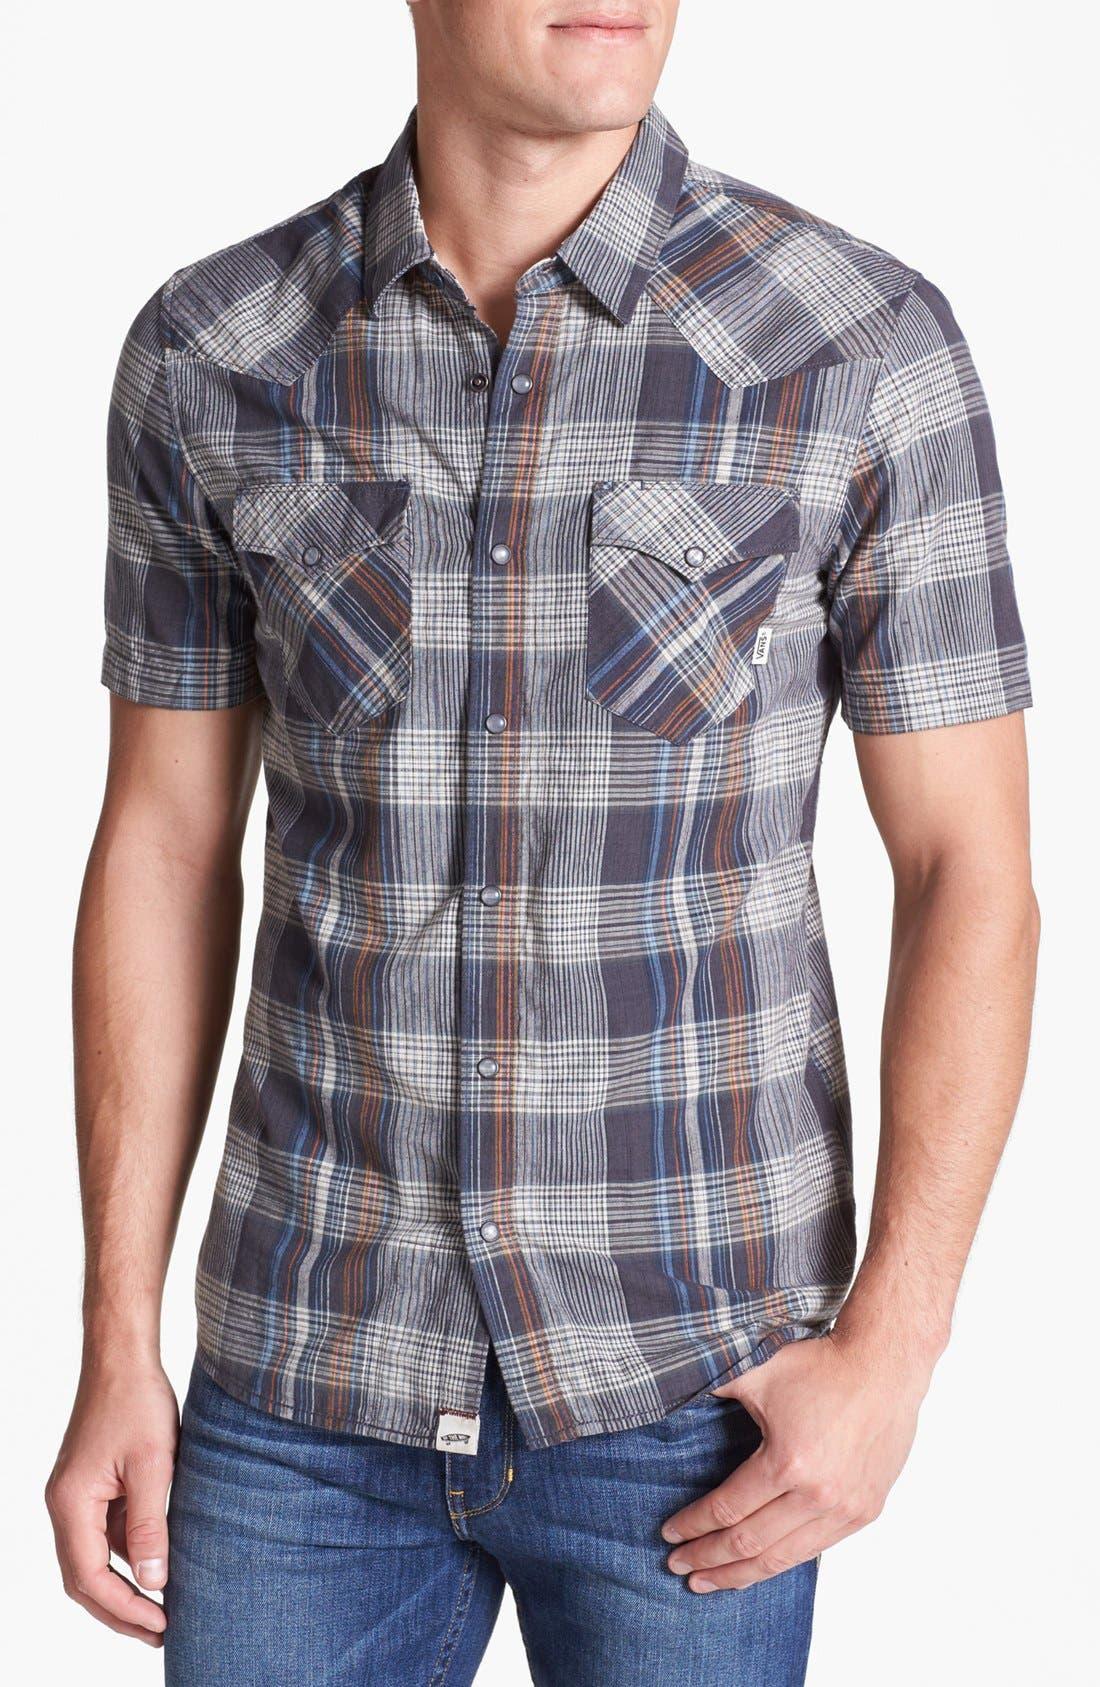 Main Image - Vans 'Windsor' Plaid Woven Shirt